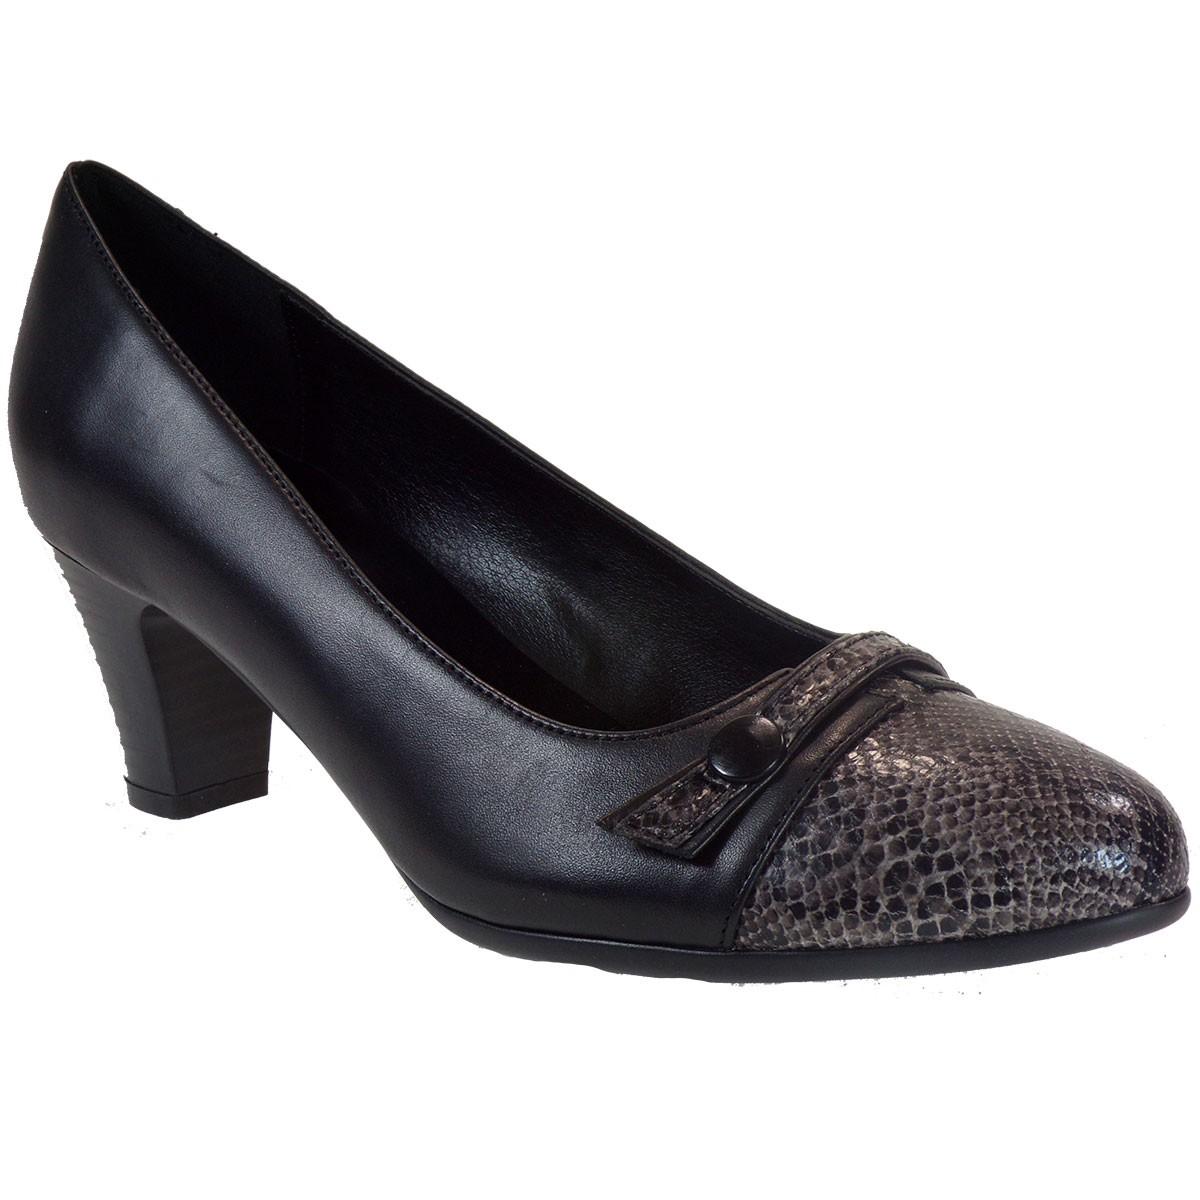 Katia Shoes (Anneto) Γυναικεία Παπούτσια Γόβες Κ53-5096 Μαύρο Φίδι